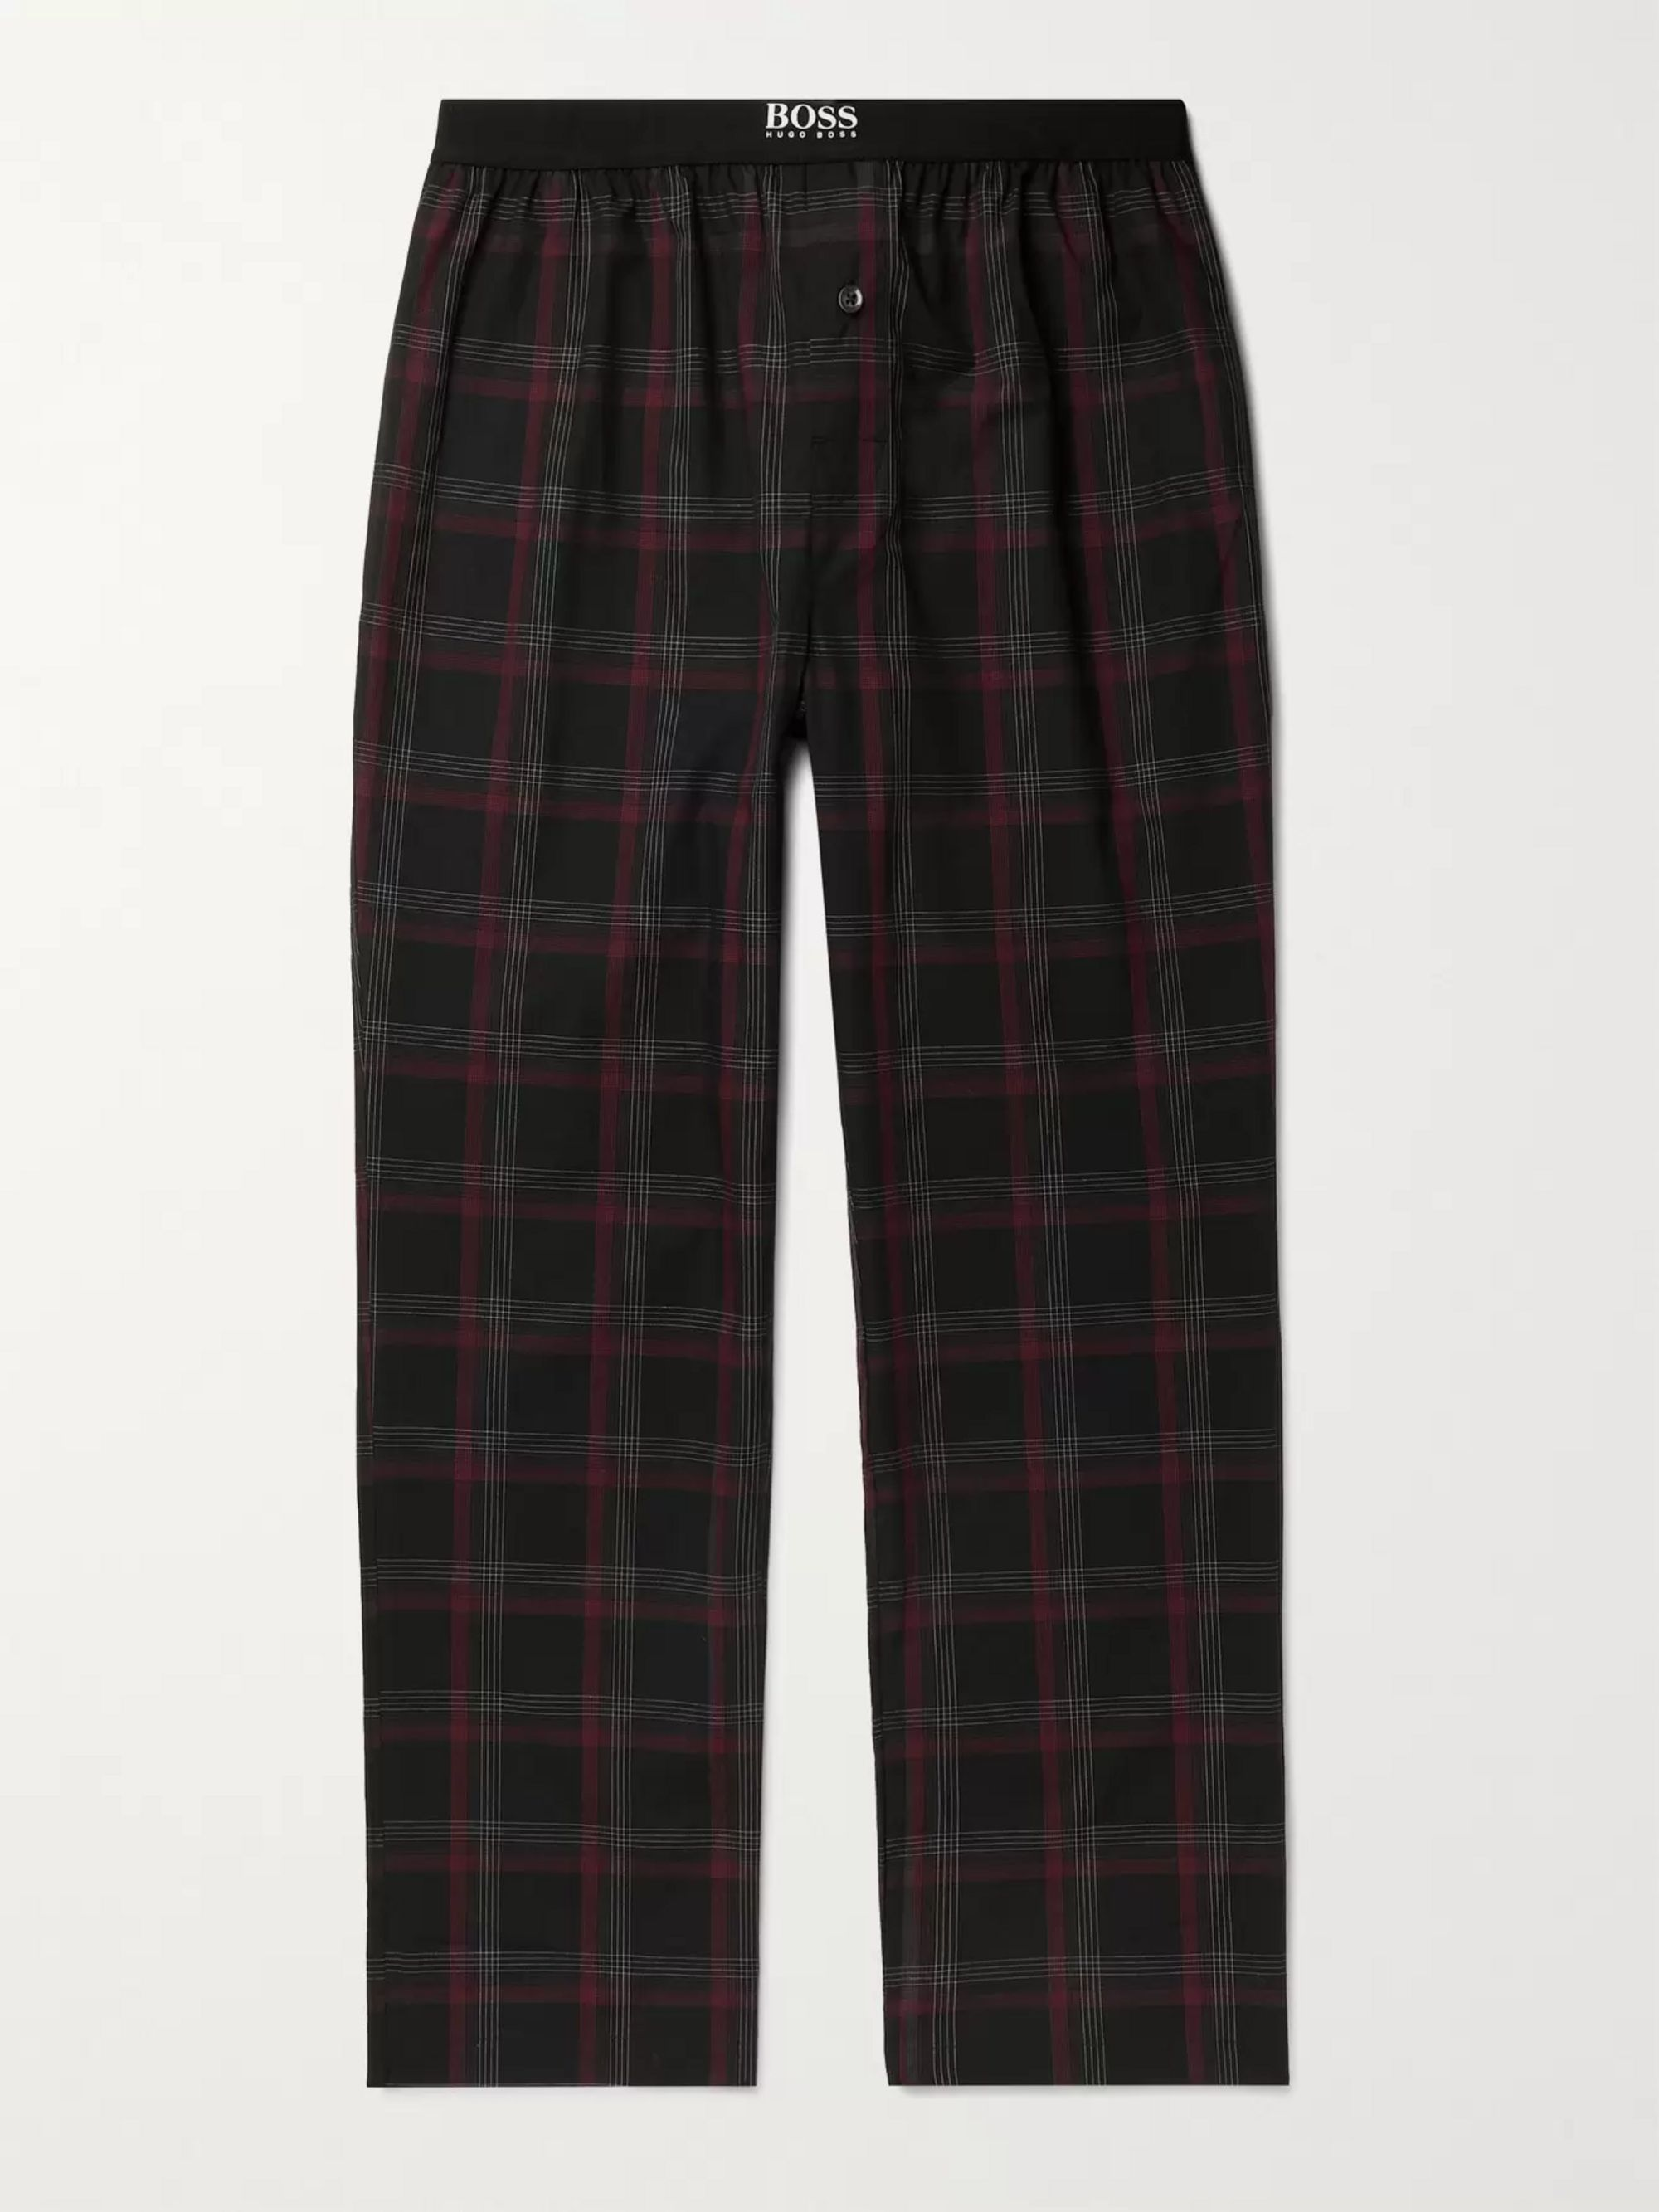 HUGO BOSS Urban Checked Cotton-Poplin Pyjama Trousers